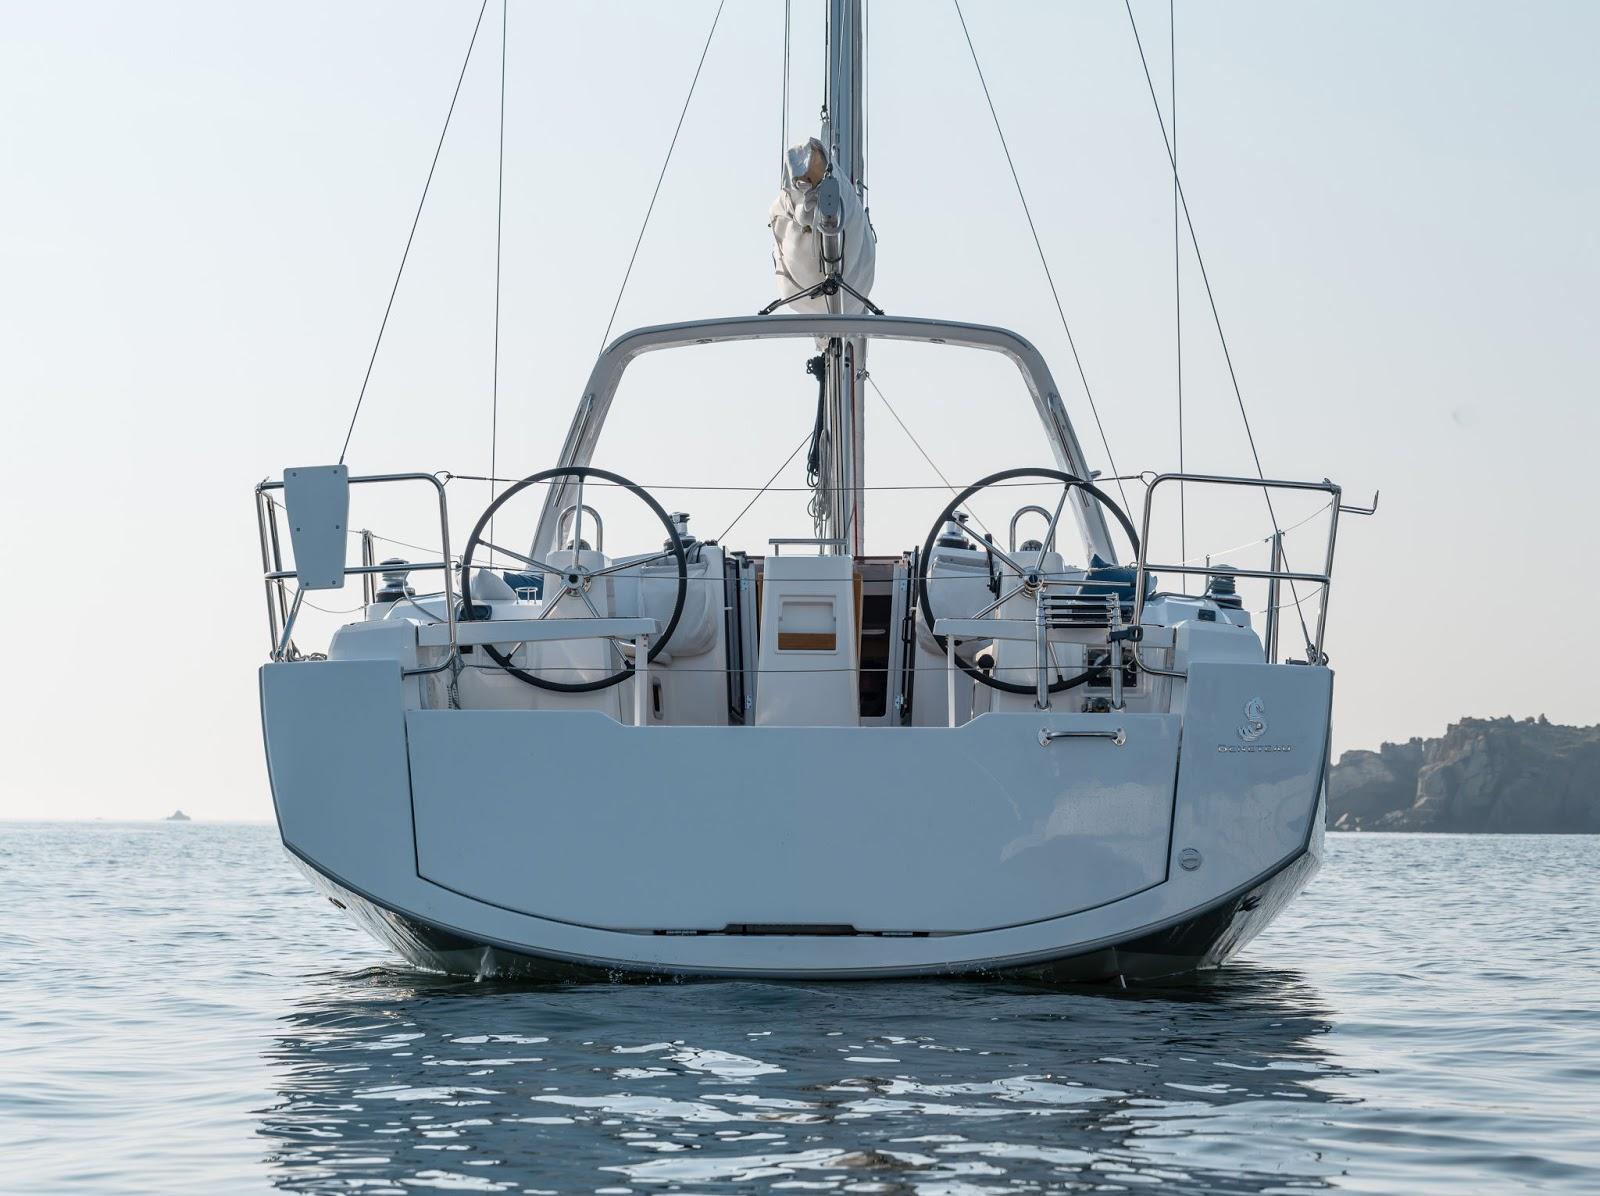 alquiler de veleros baratos en ibiza. alquiler veleros baratos ibiza. alquiler de barcos baratos en ibiza. alquiler barcos ibiza. alquilar yates en ibiza. barcos de alquiler en ibiza